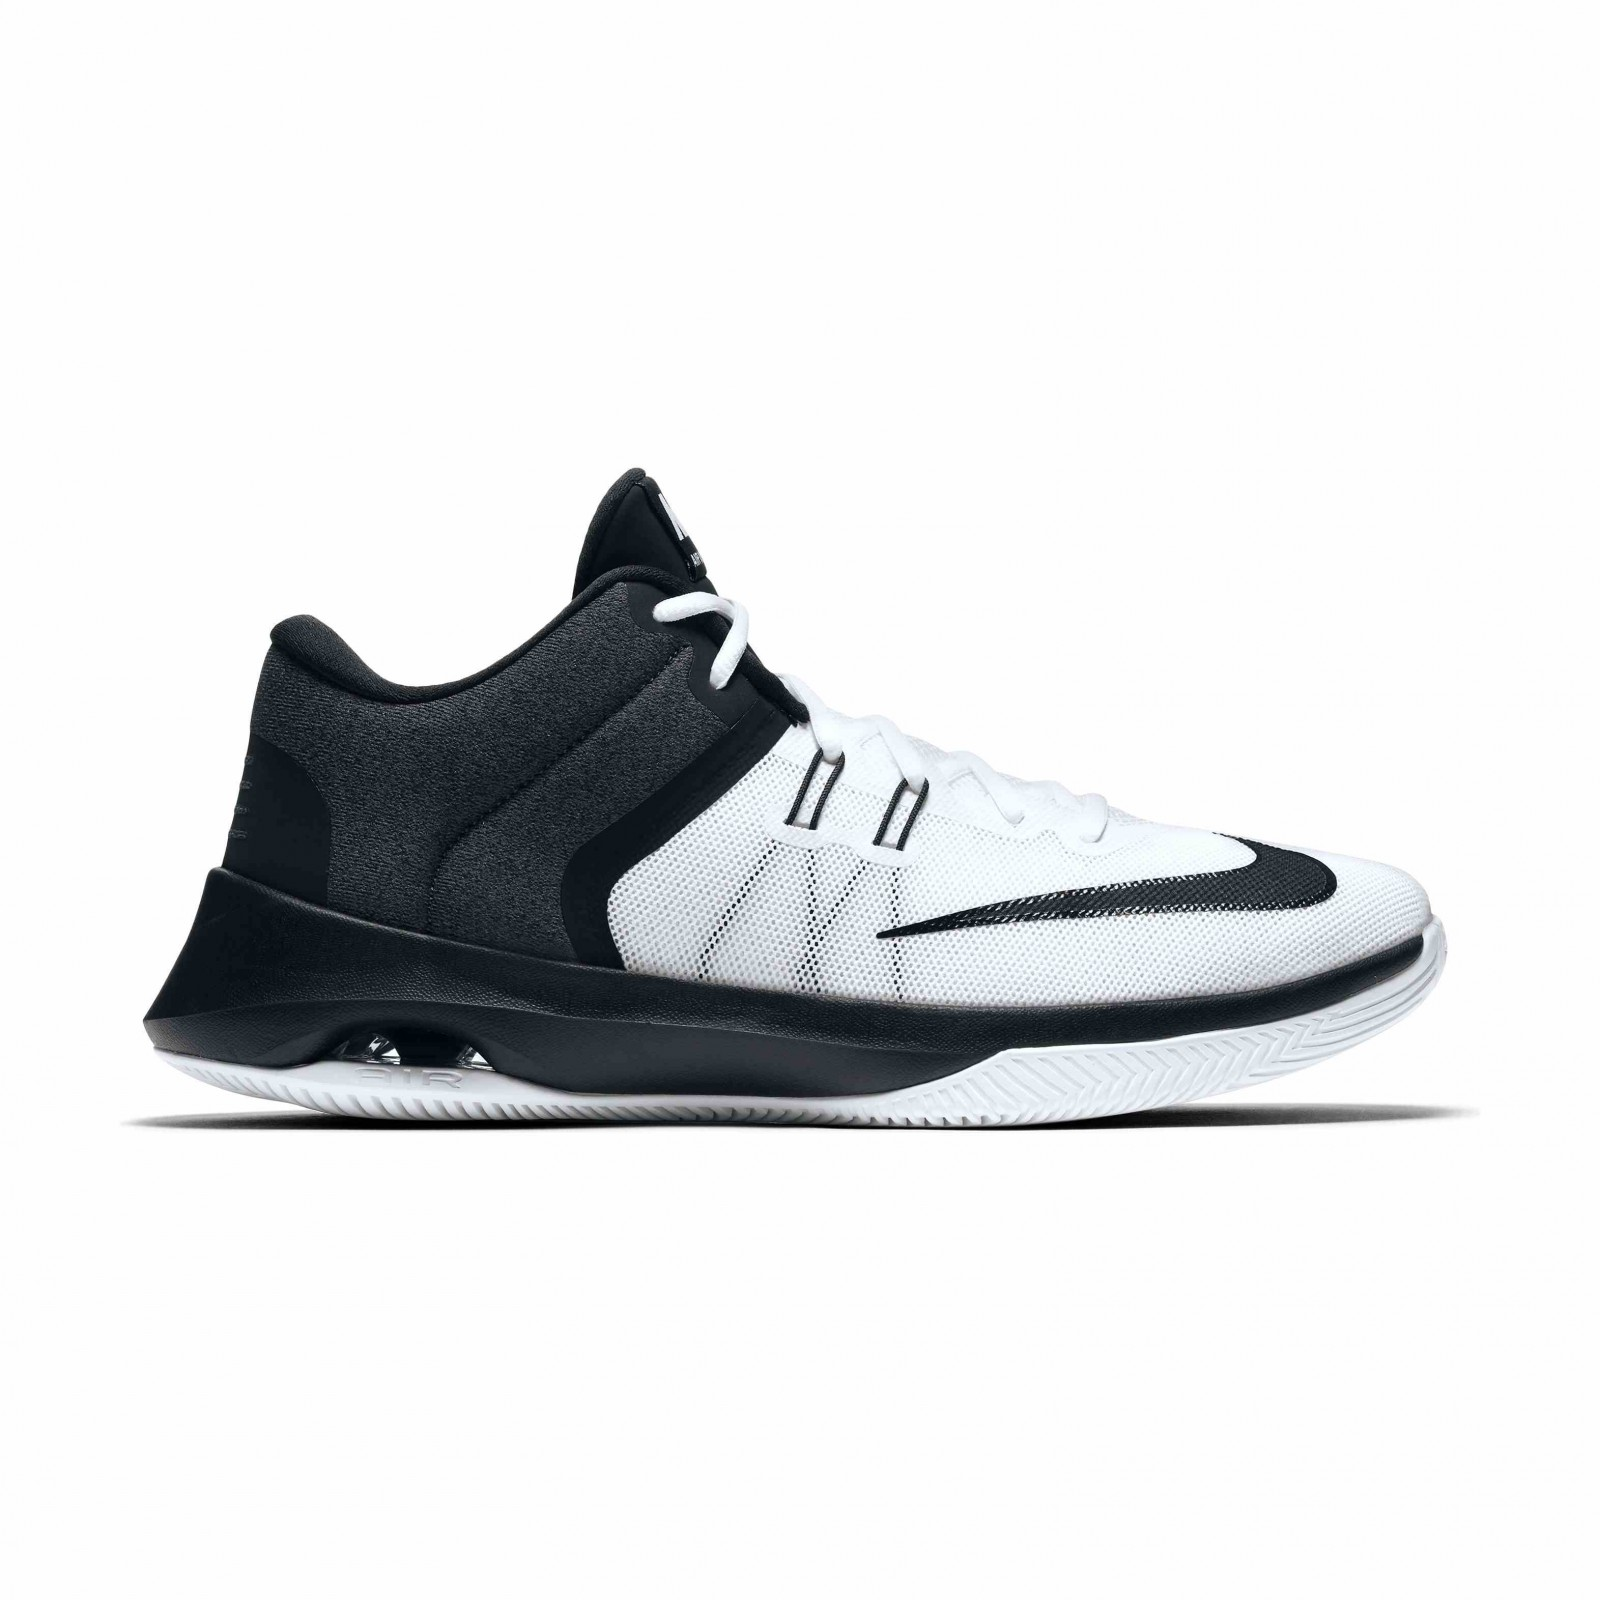 cf3879dd769 Pánské Basketbalové boty Nike AIR VERSITILE II